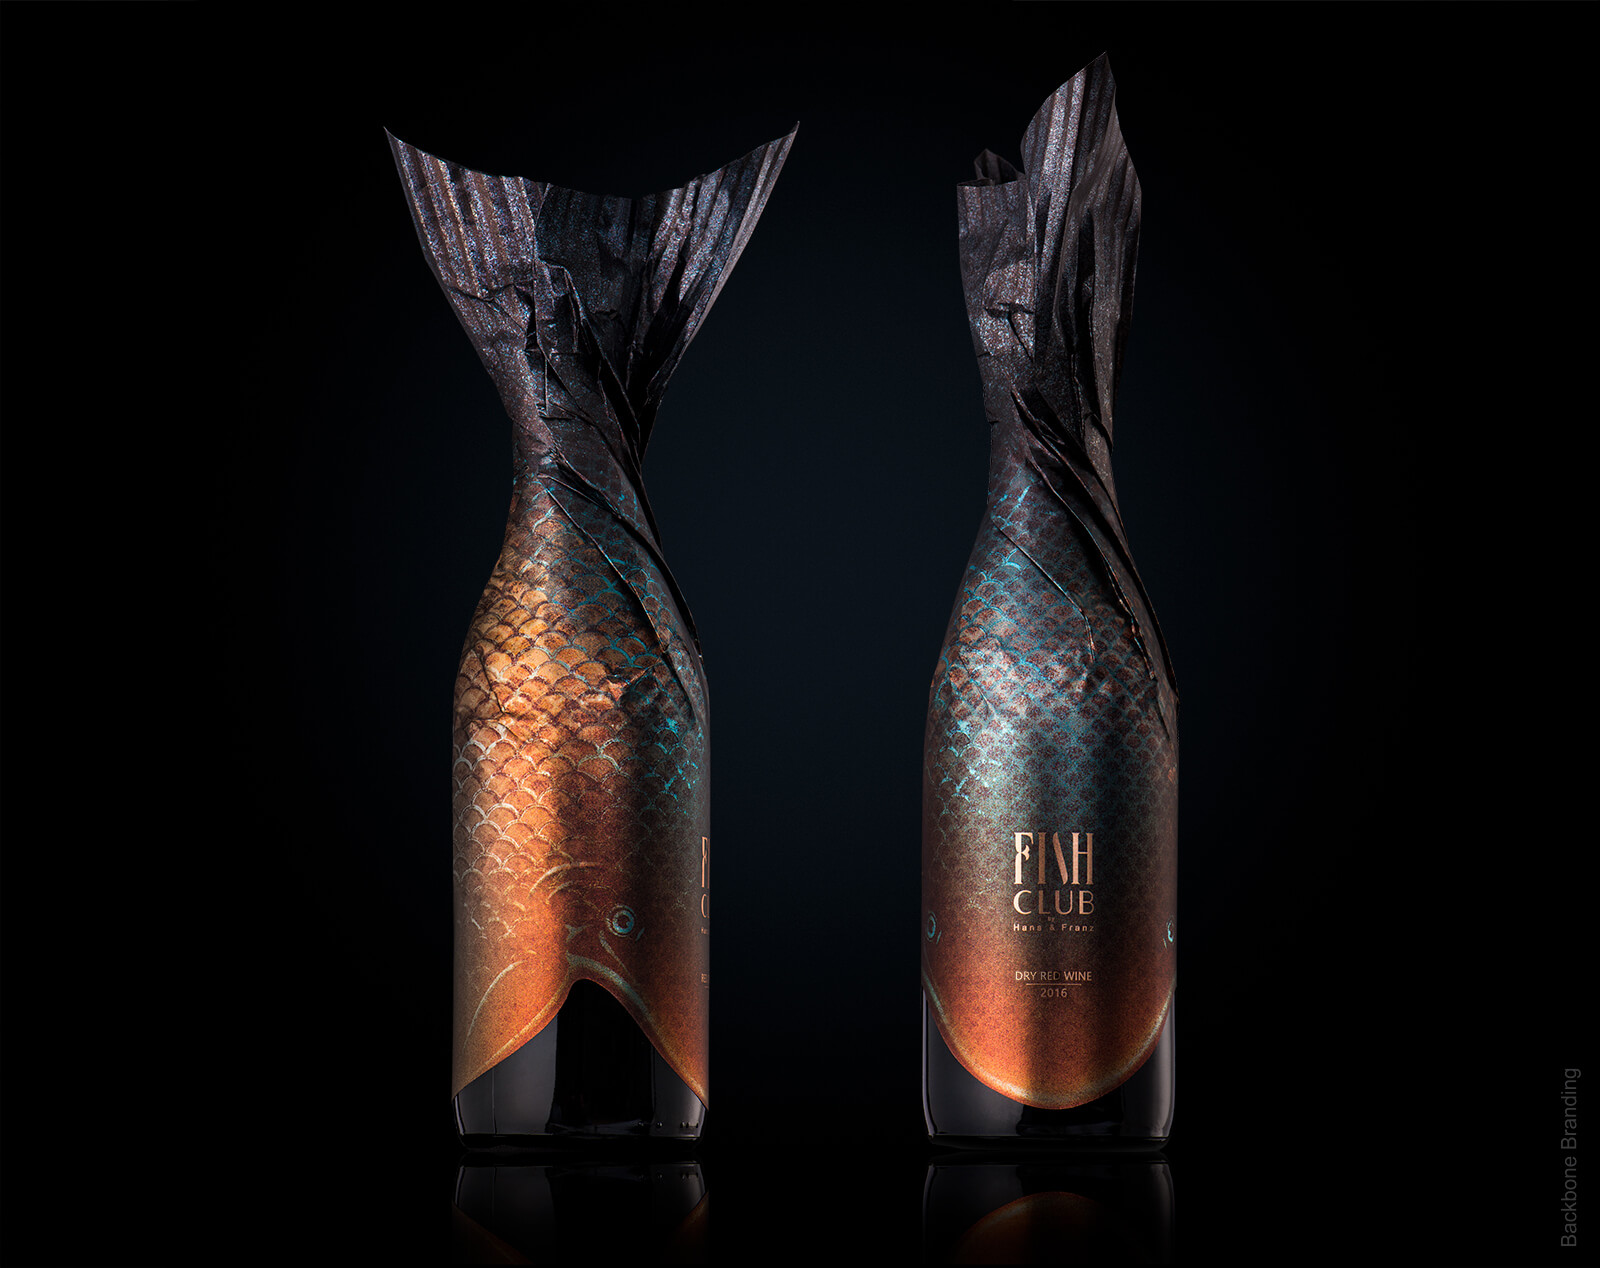 Bouteilles d'alcool avec un packaging original